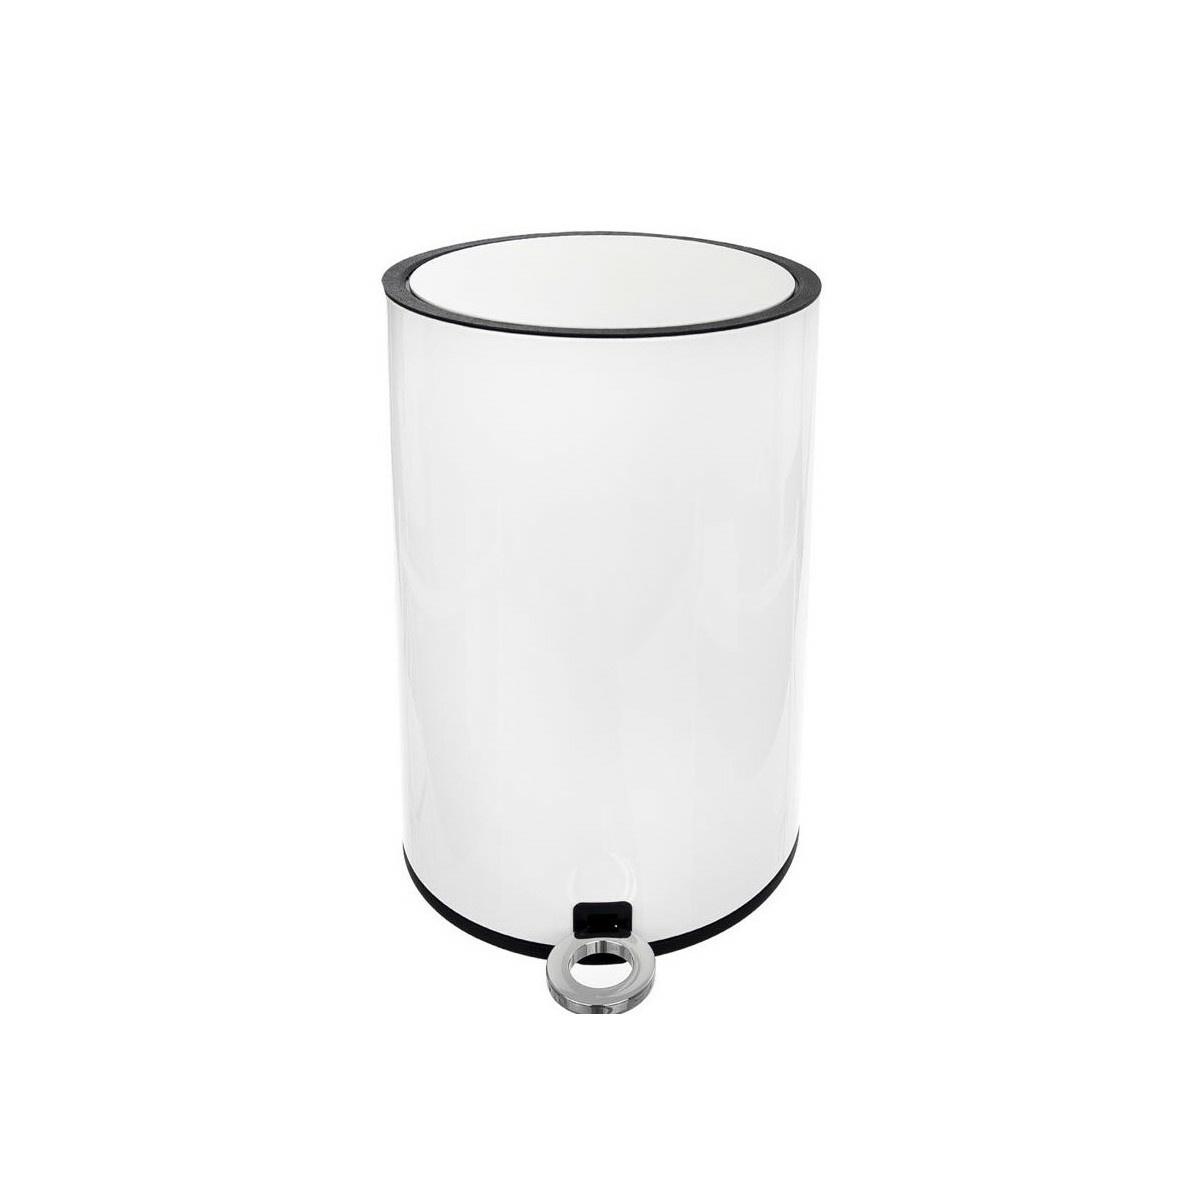 Coș de gunoi cu pedală Orion WHITE, 6 l imagine 2021 e4home.ro